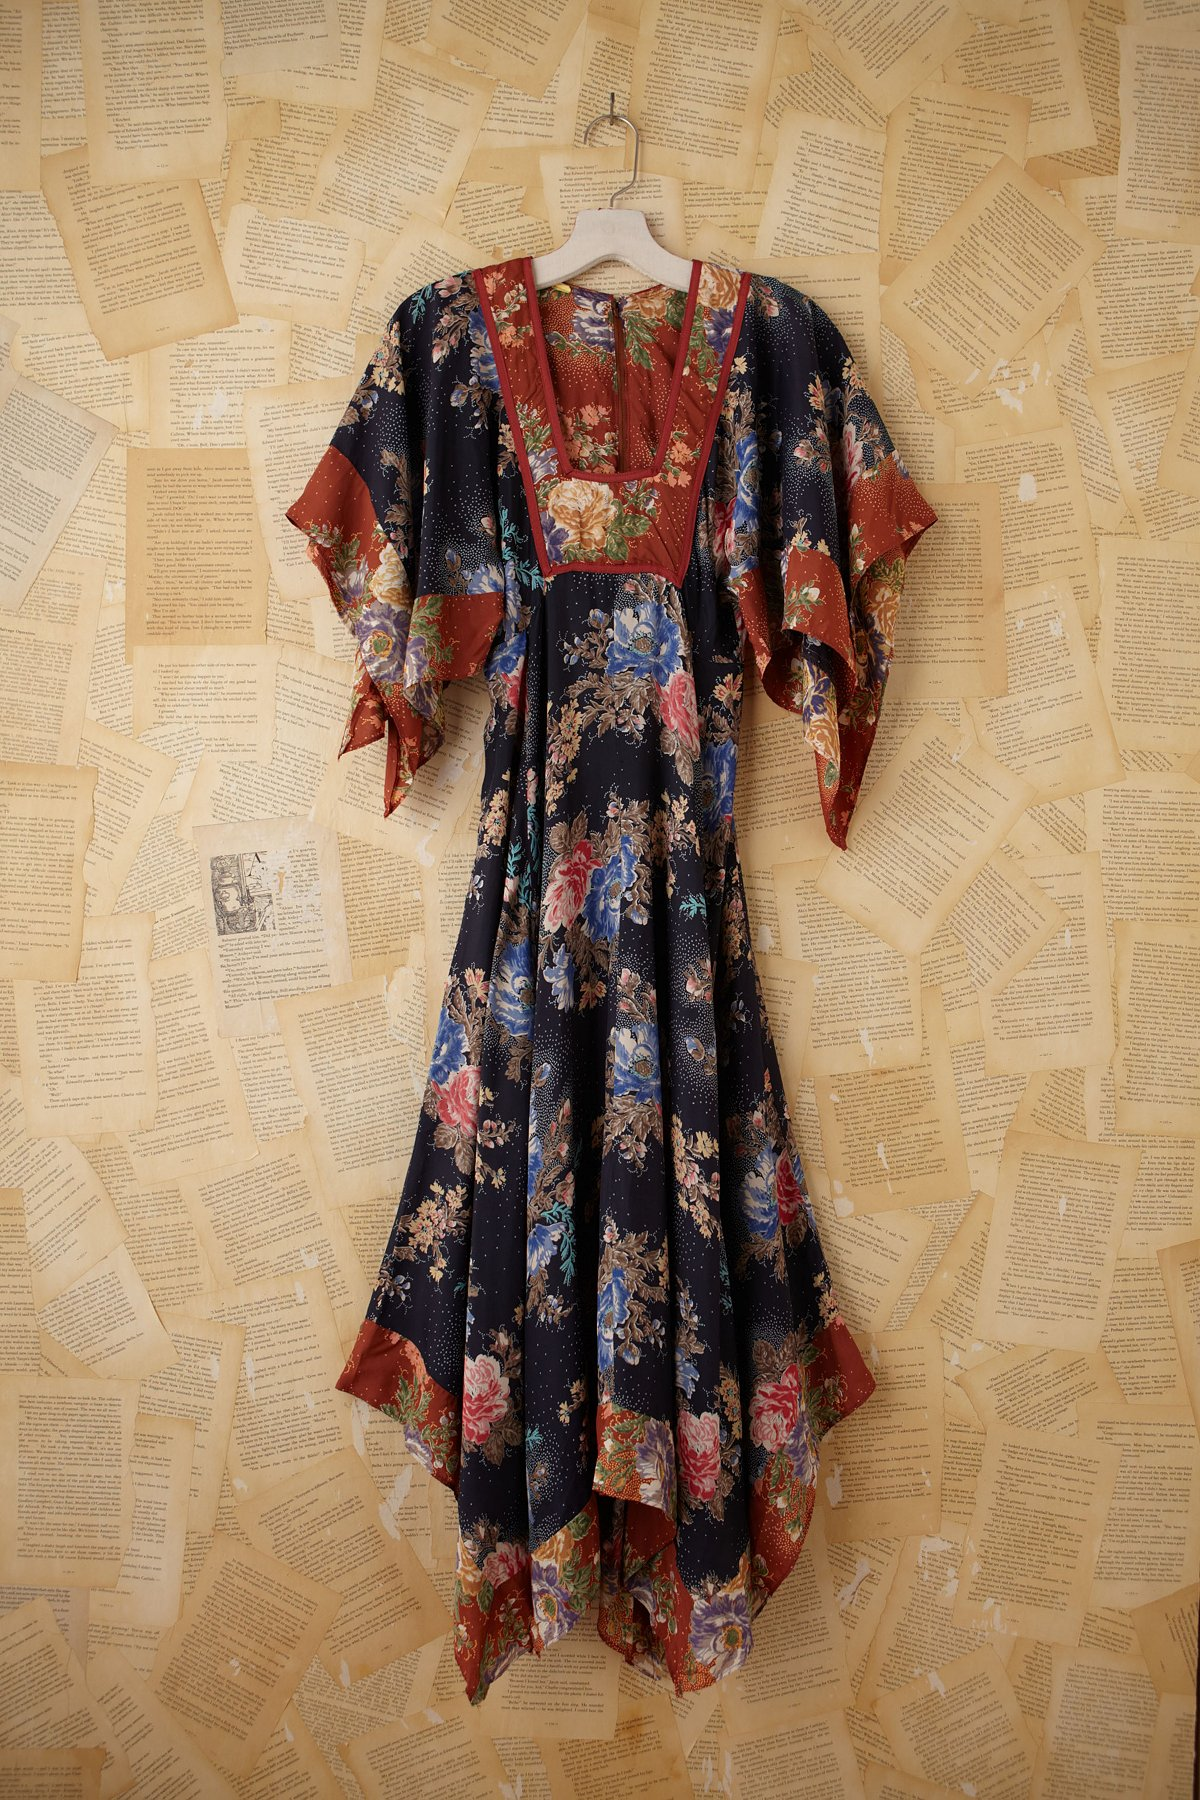 Vintage Floral Printed Empire Waist Maxi Dress